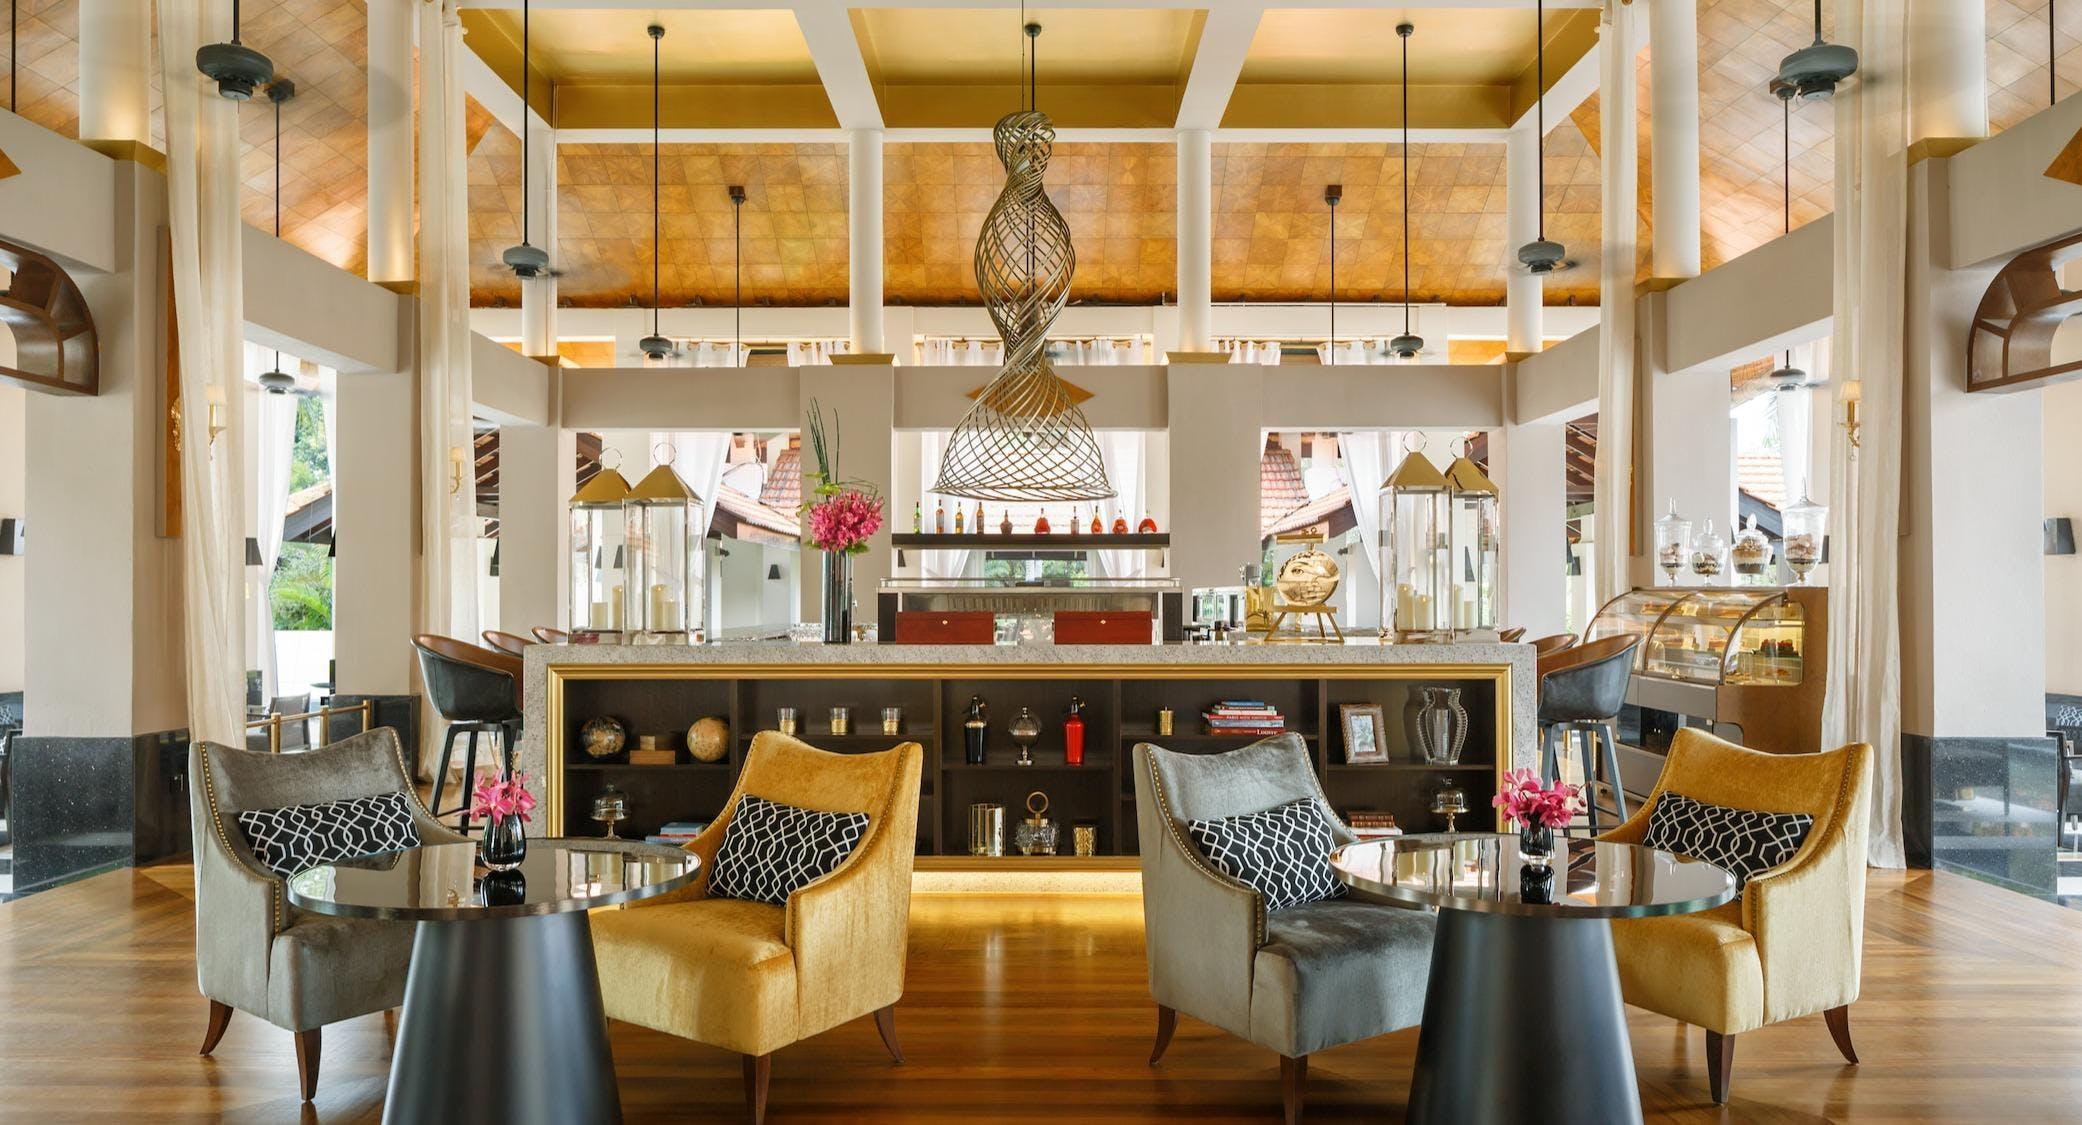 Photo of restaurant LeBar in Sentosa, Singapore